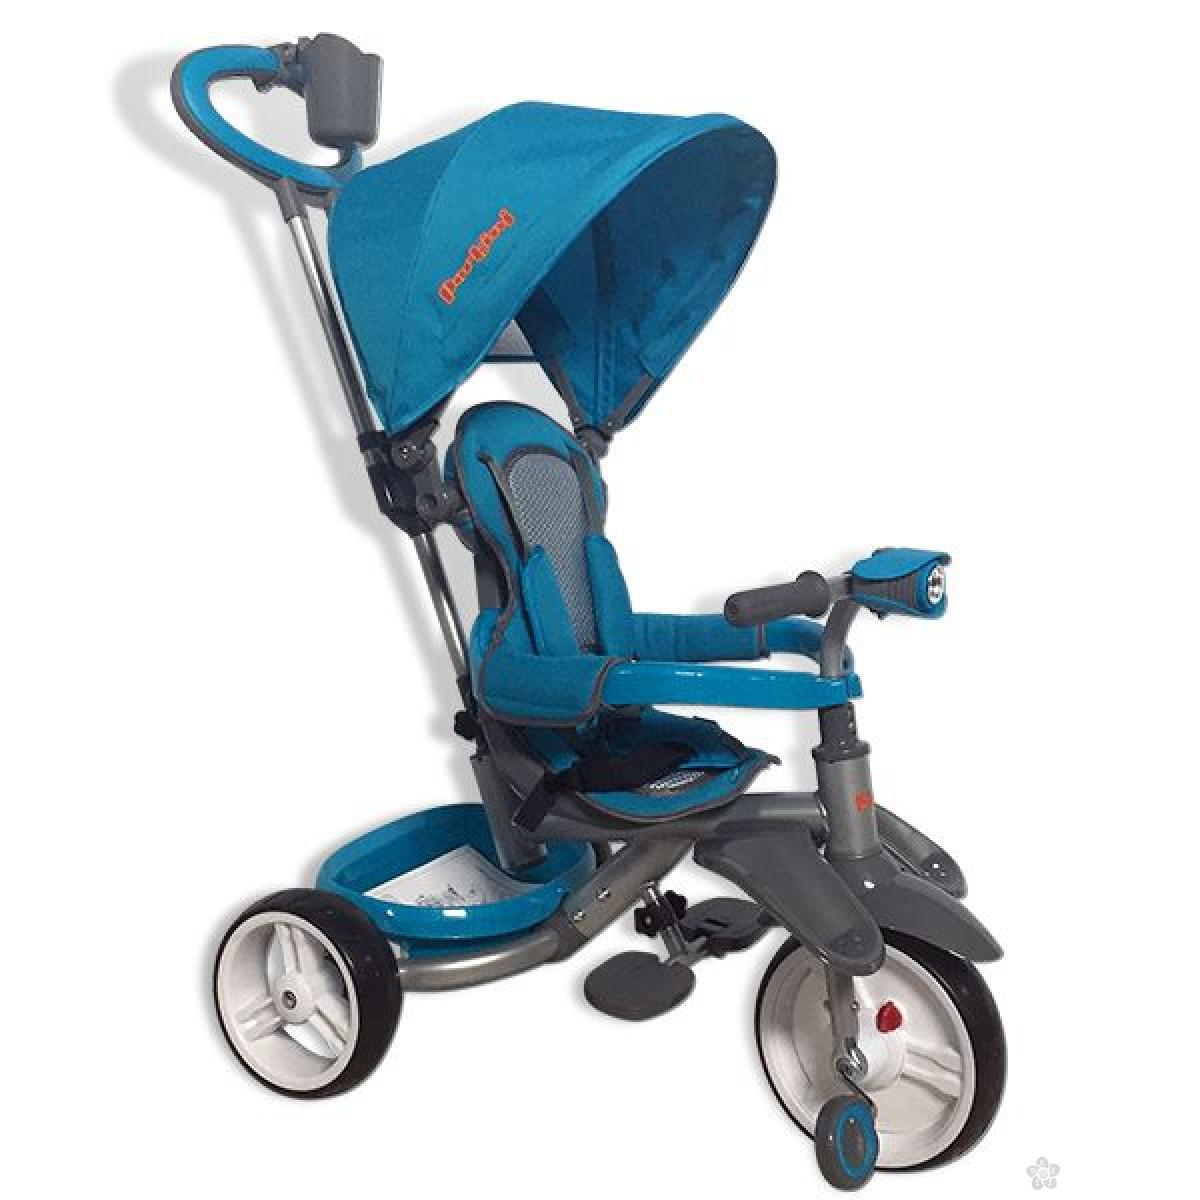 Tricikl sa svetlima Z100 plavi